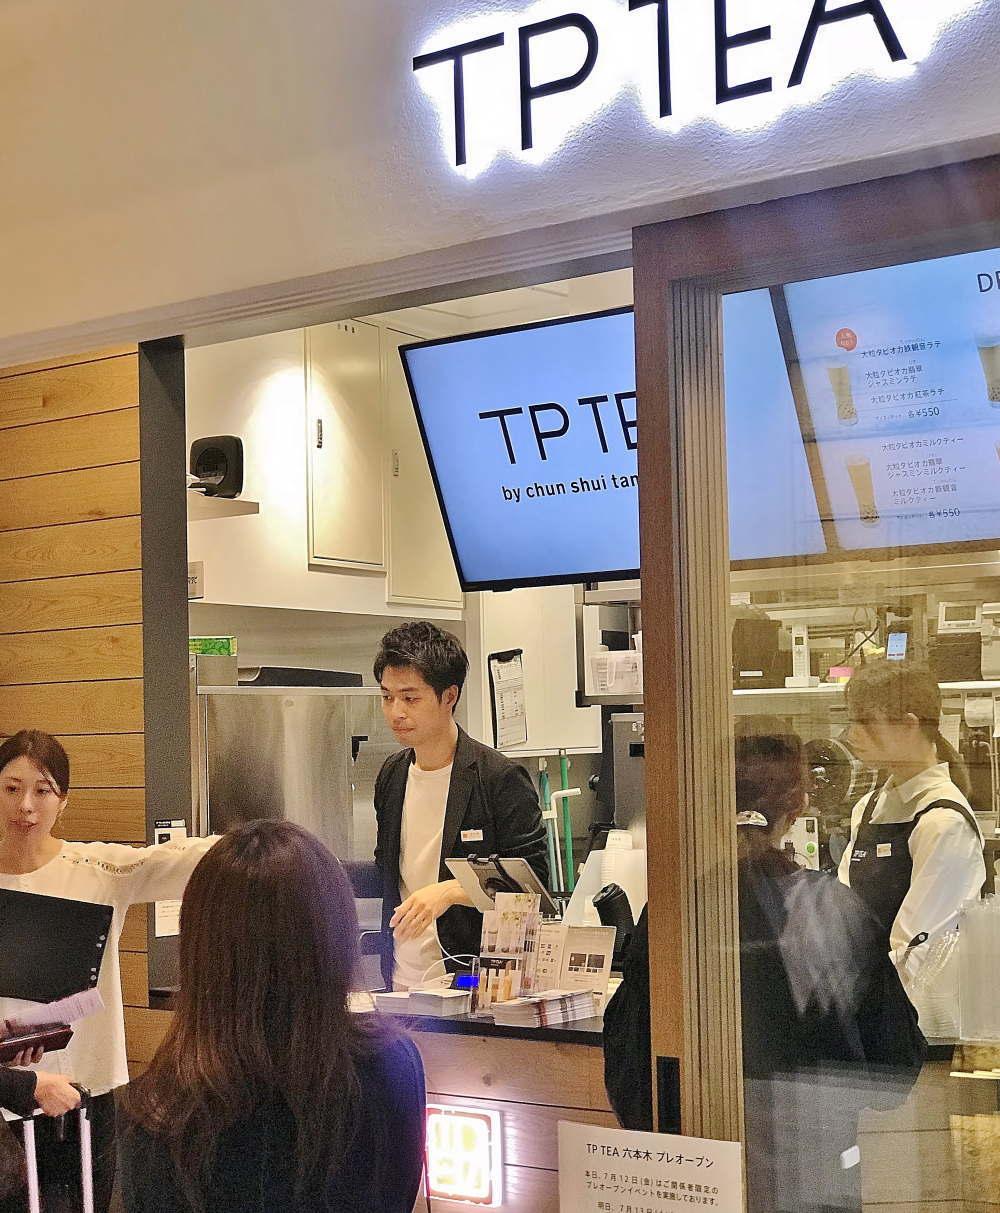 TP TEA 六本木ヒルズ店